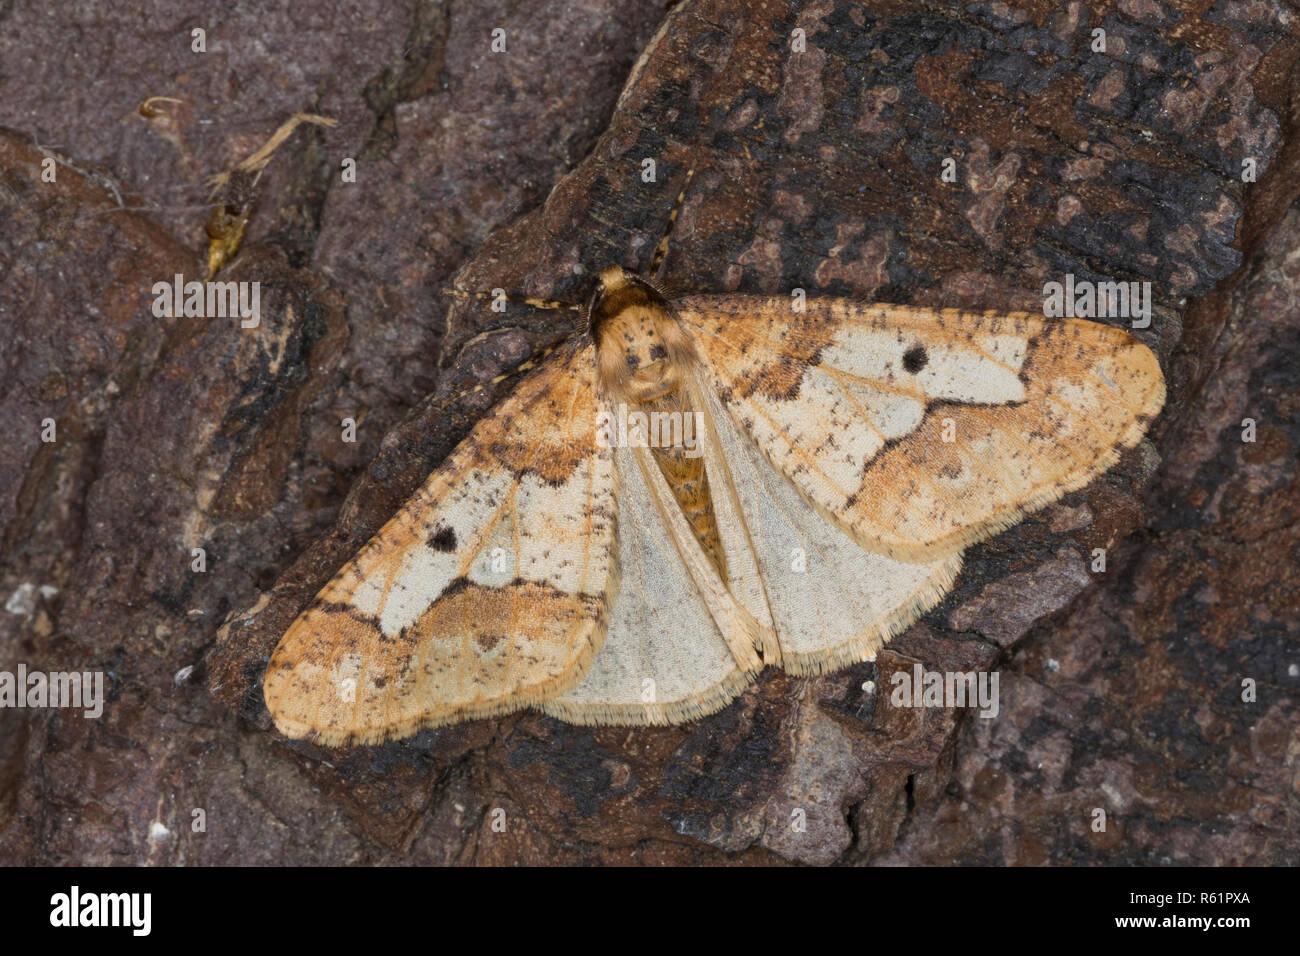 Großer Frostspanner, Männchen, Erannis defoliaria, Phalaena defoliaria, Hybernia defoliaria, Mottled Umber, male, L'Hibernie défeuillante, Spanner - Stock Image